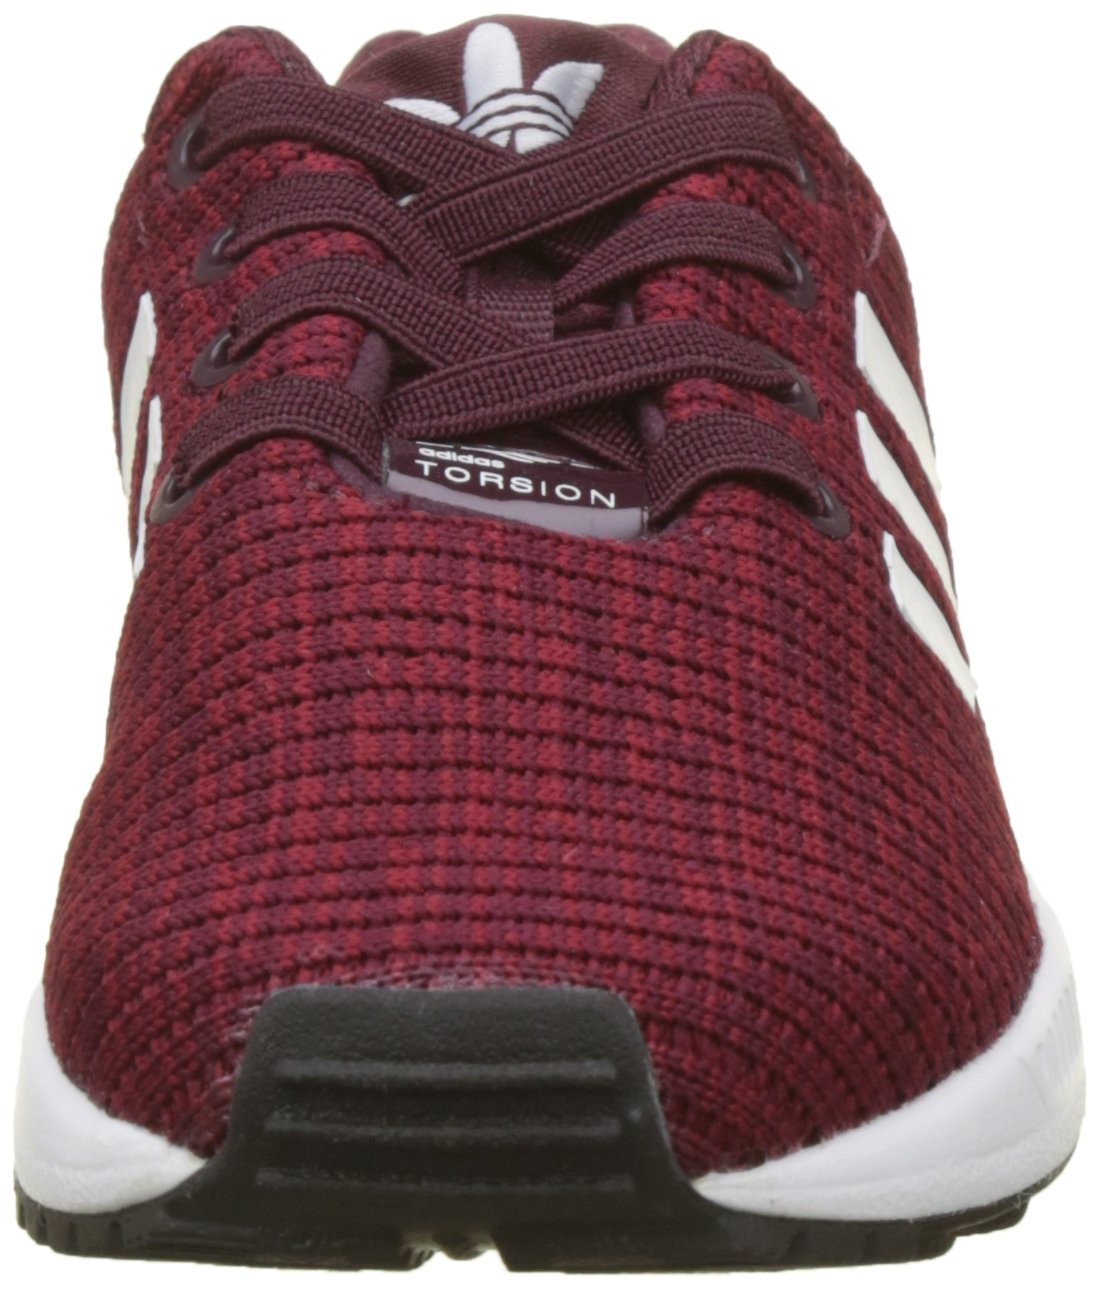 adidas ZX Flux El I, Pantofole Unisex – Bimbi 0-24 4 spesavip